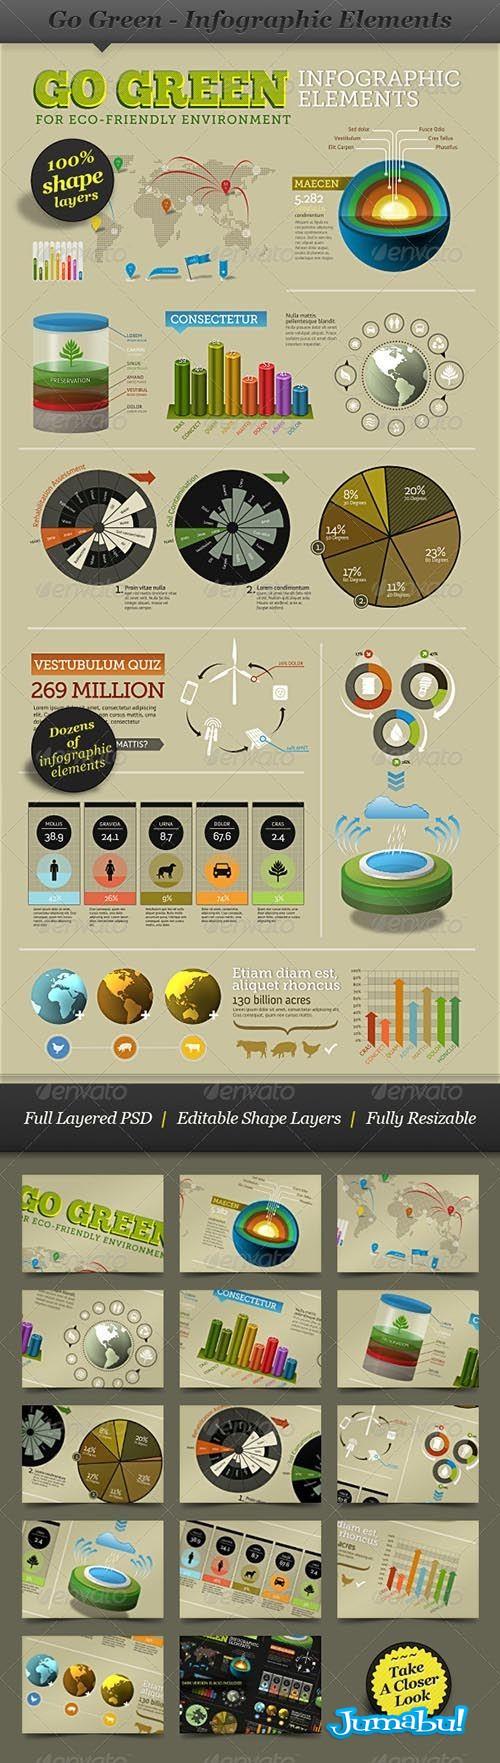 infografia ecologica verde - Infografía Verde - Ecológica